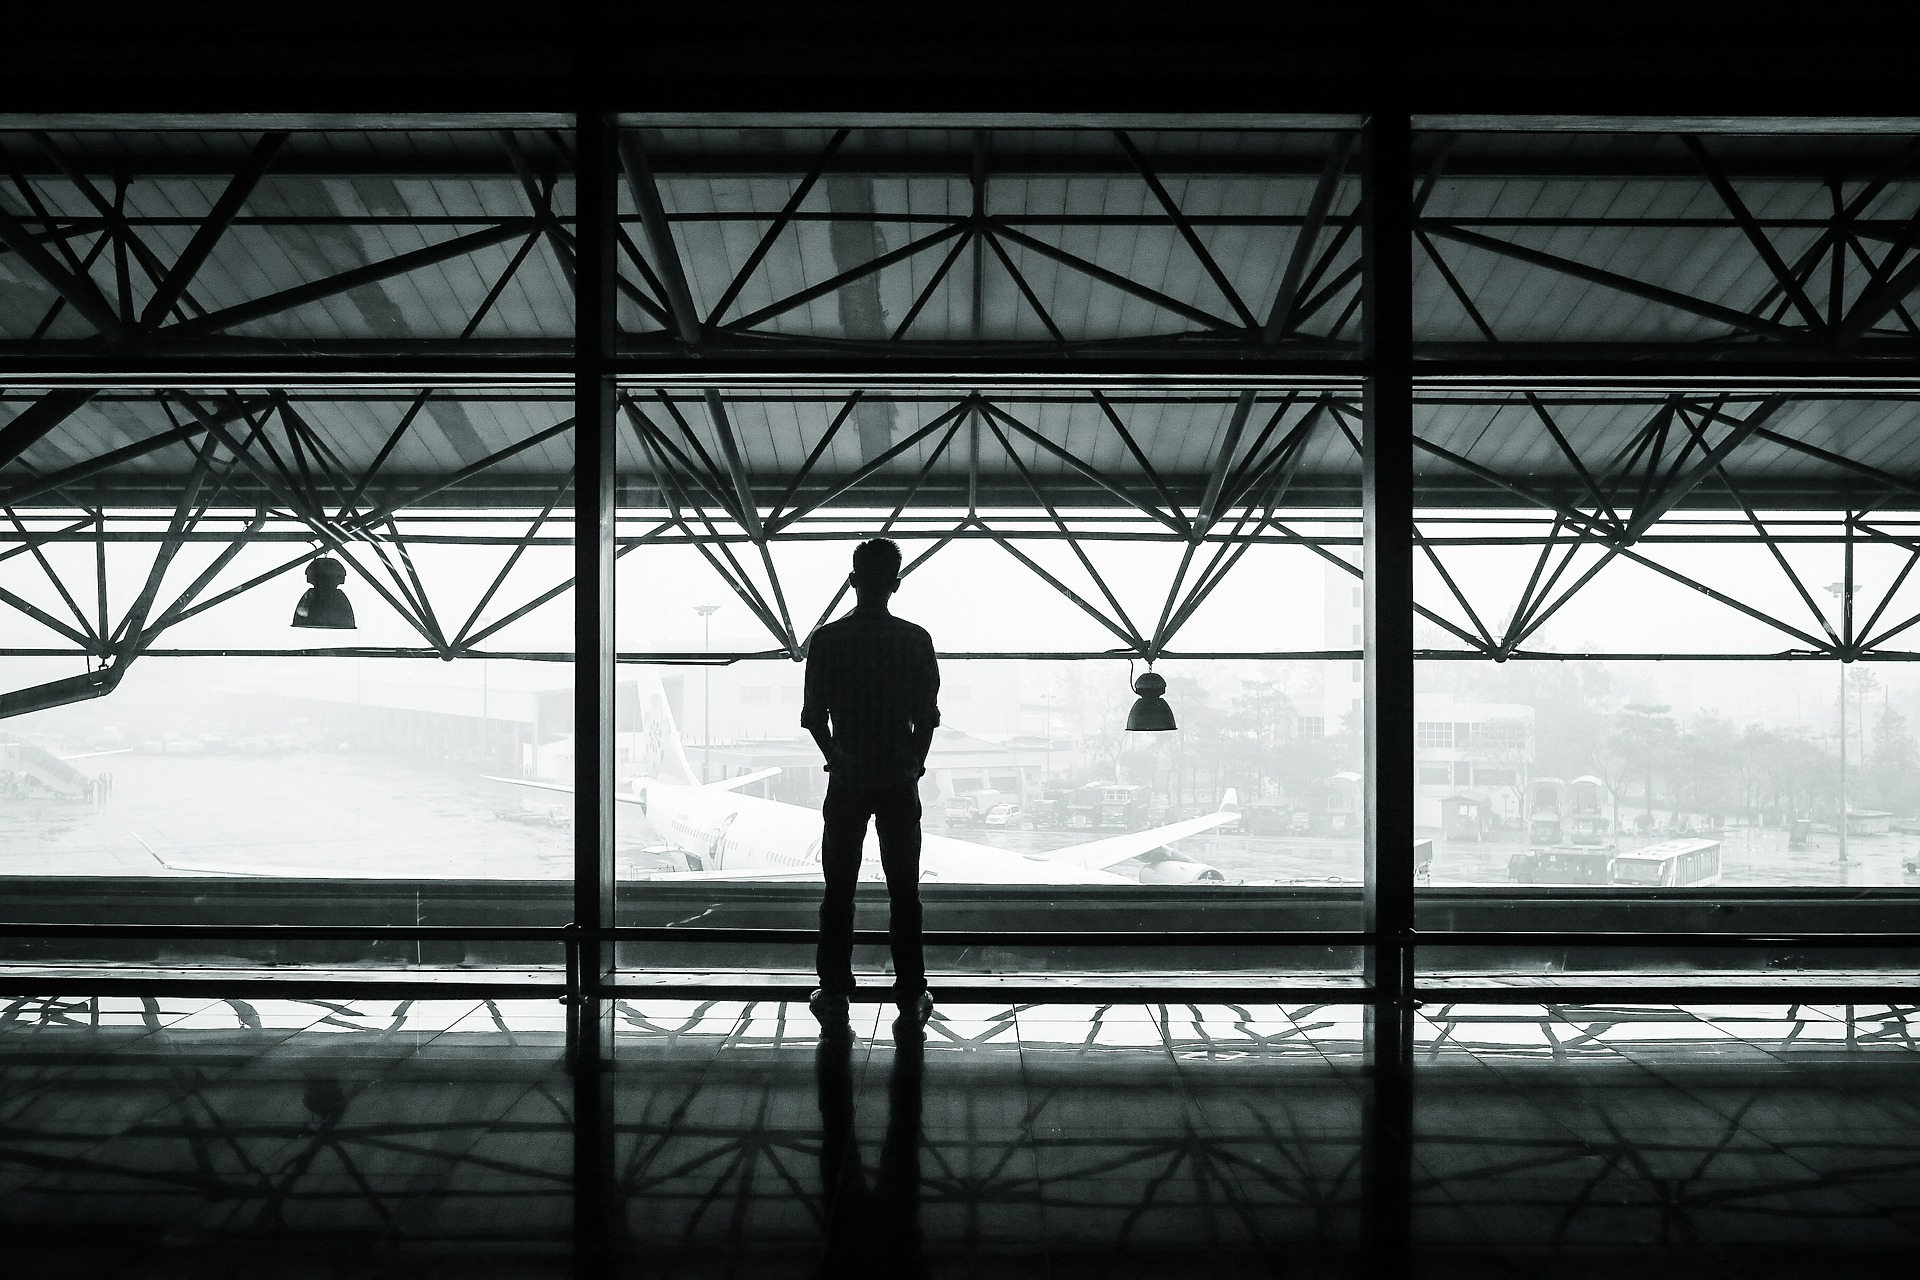 airport-351472_1920.jpg